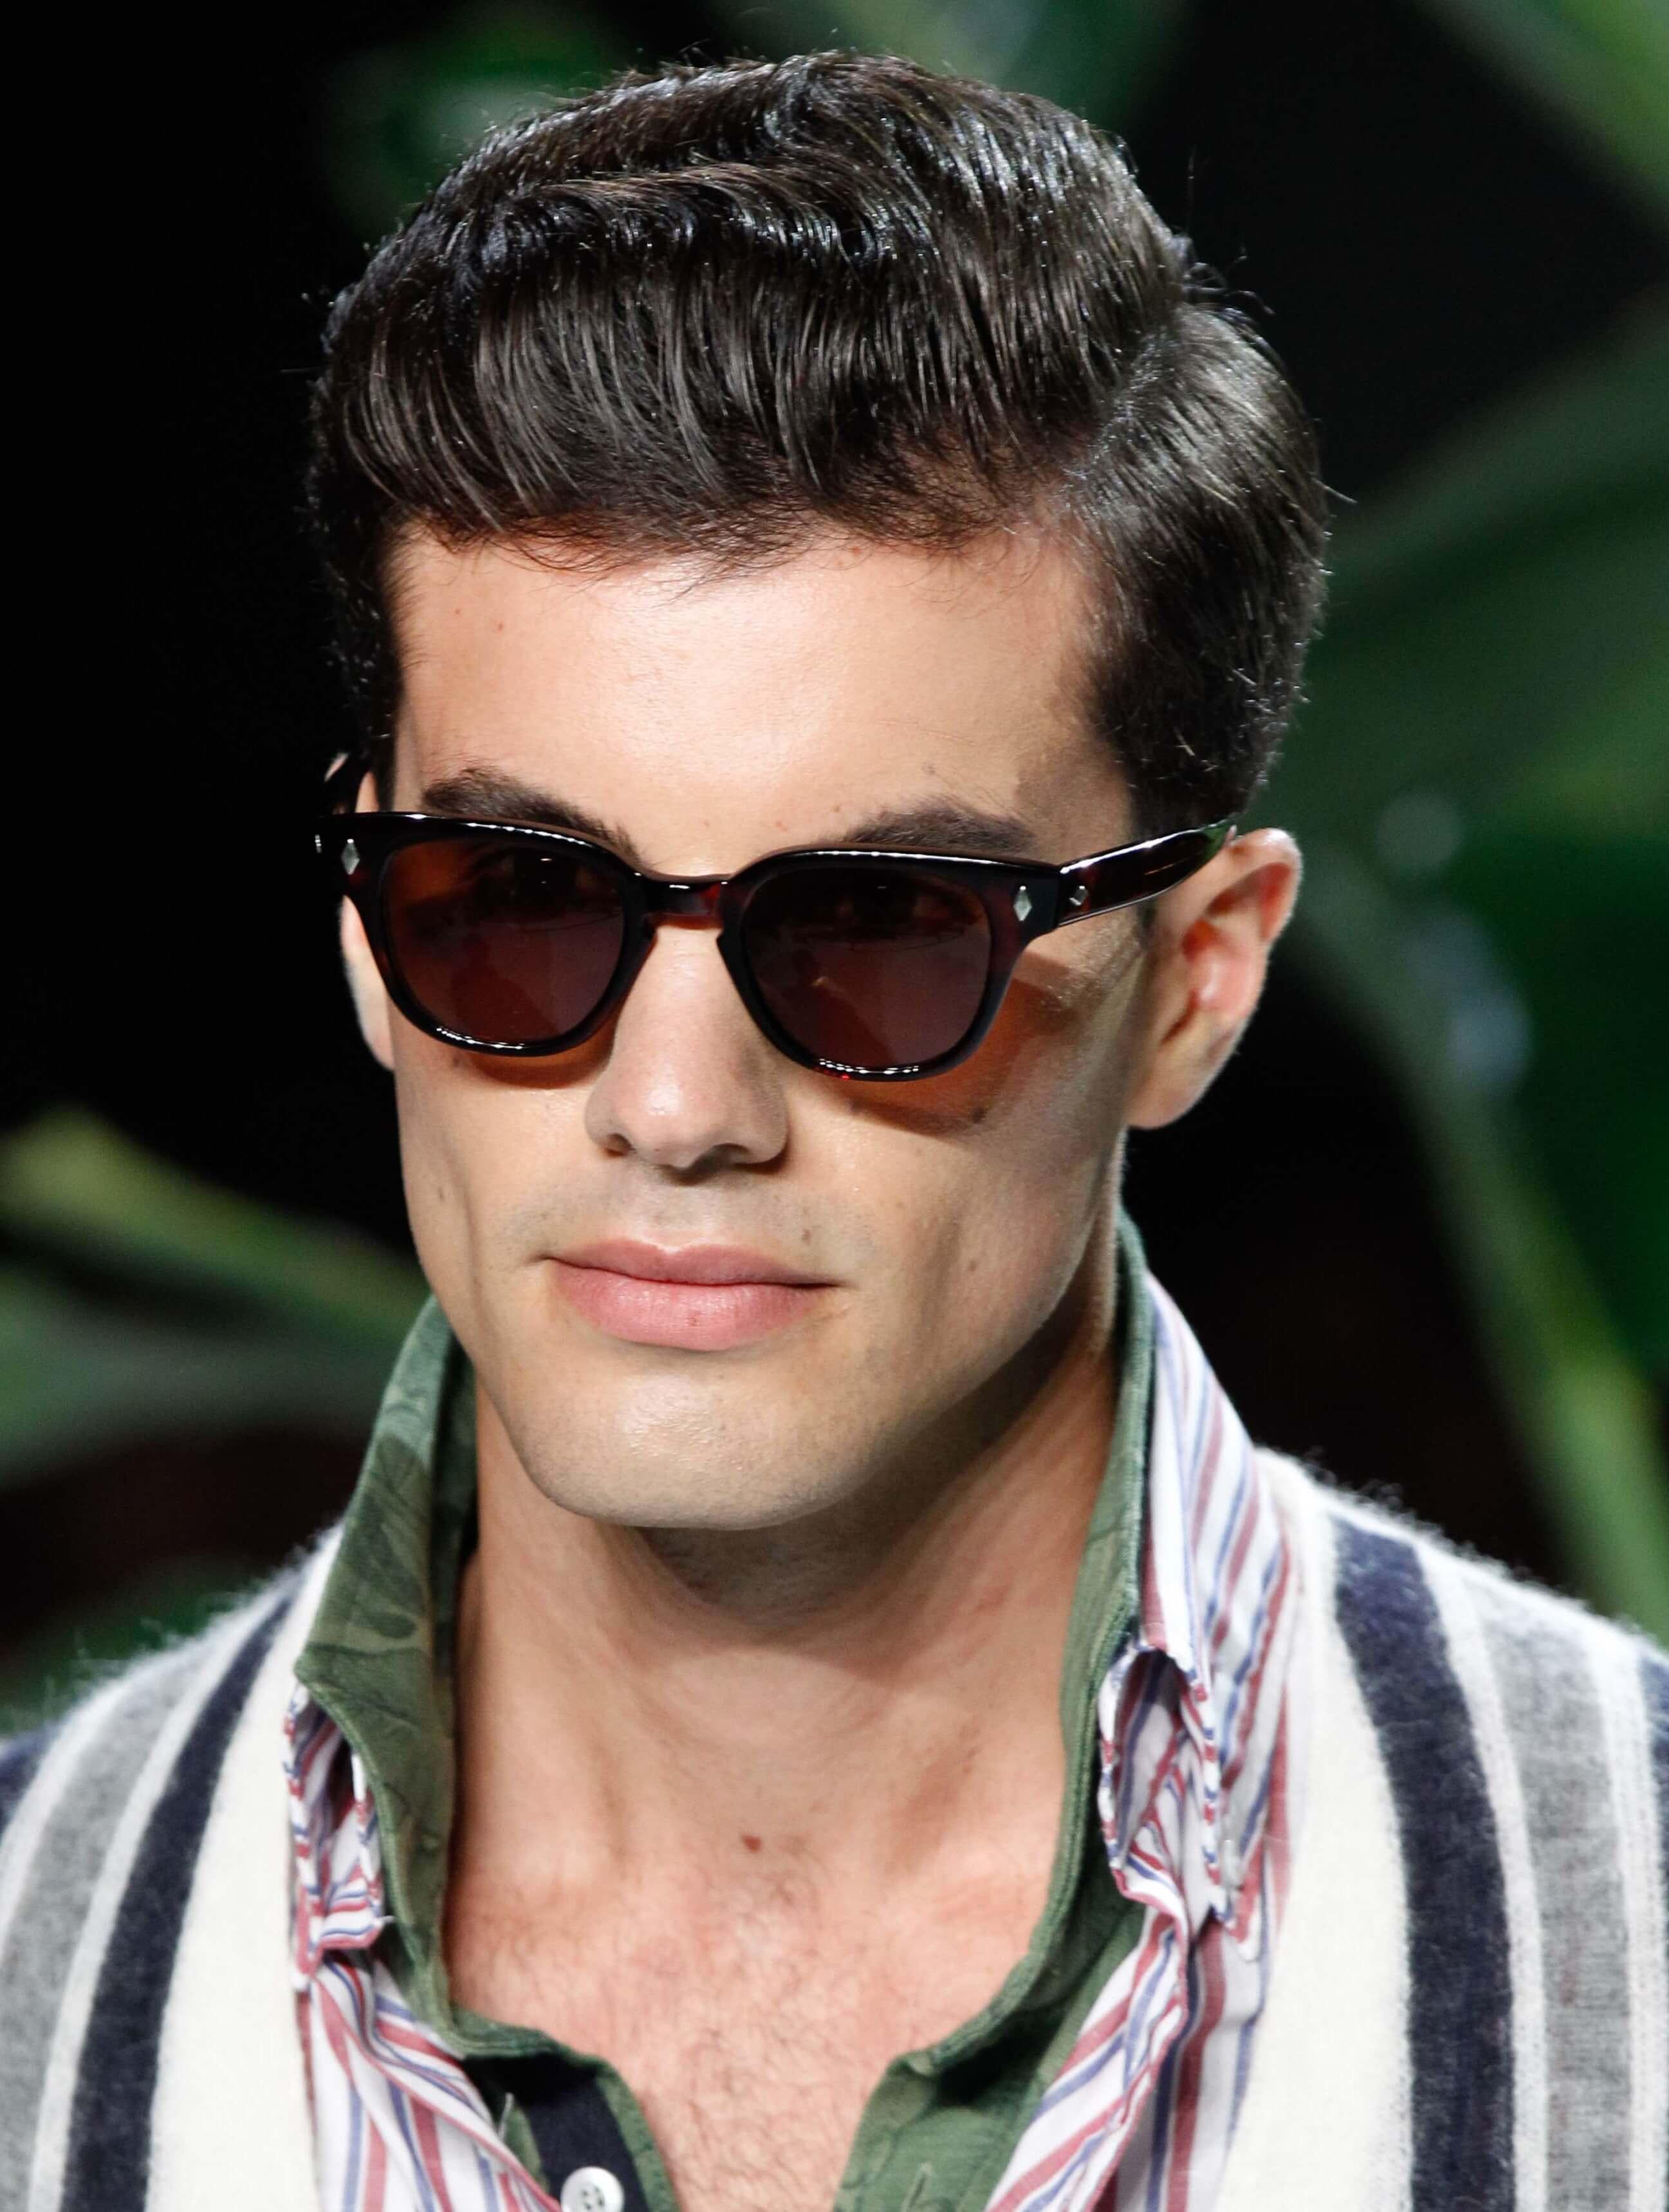 Mens Medium Hairstyles 5 Inspiring Ideas All Things Hair Uk